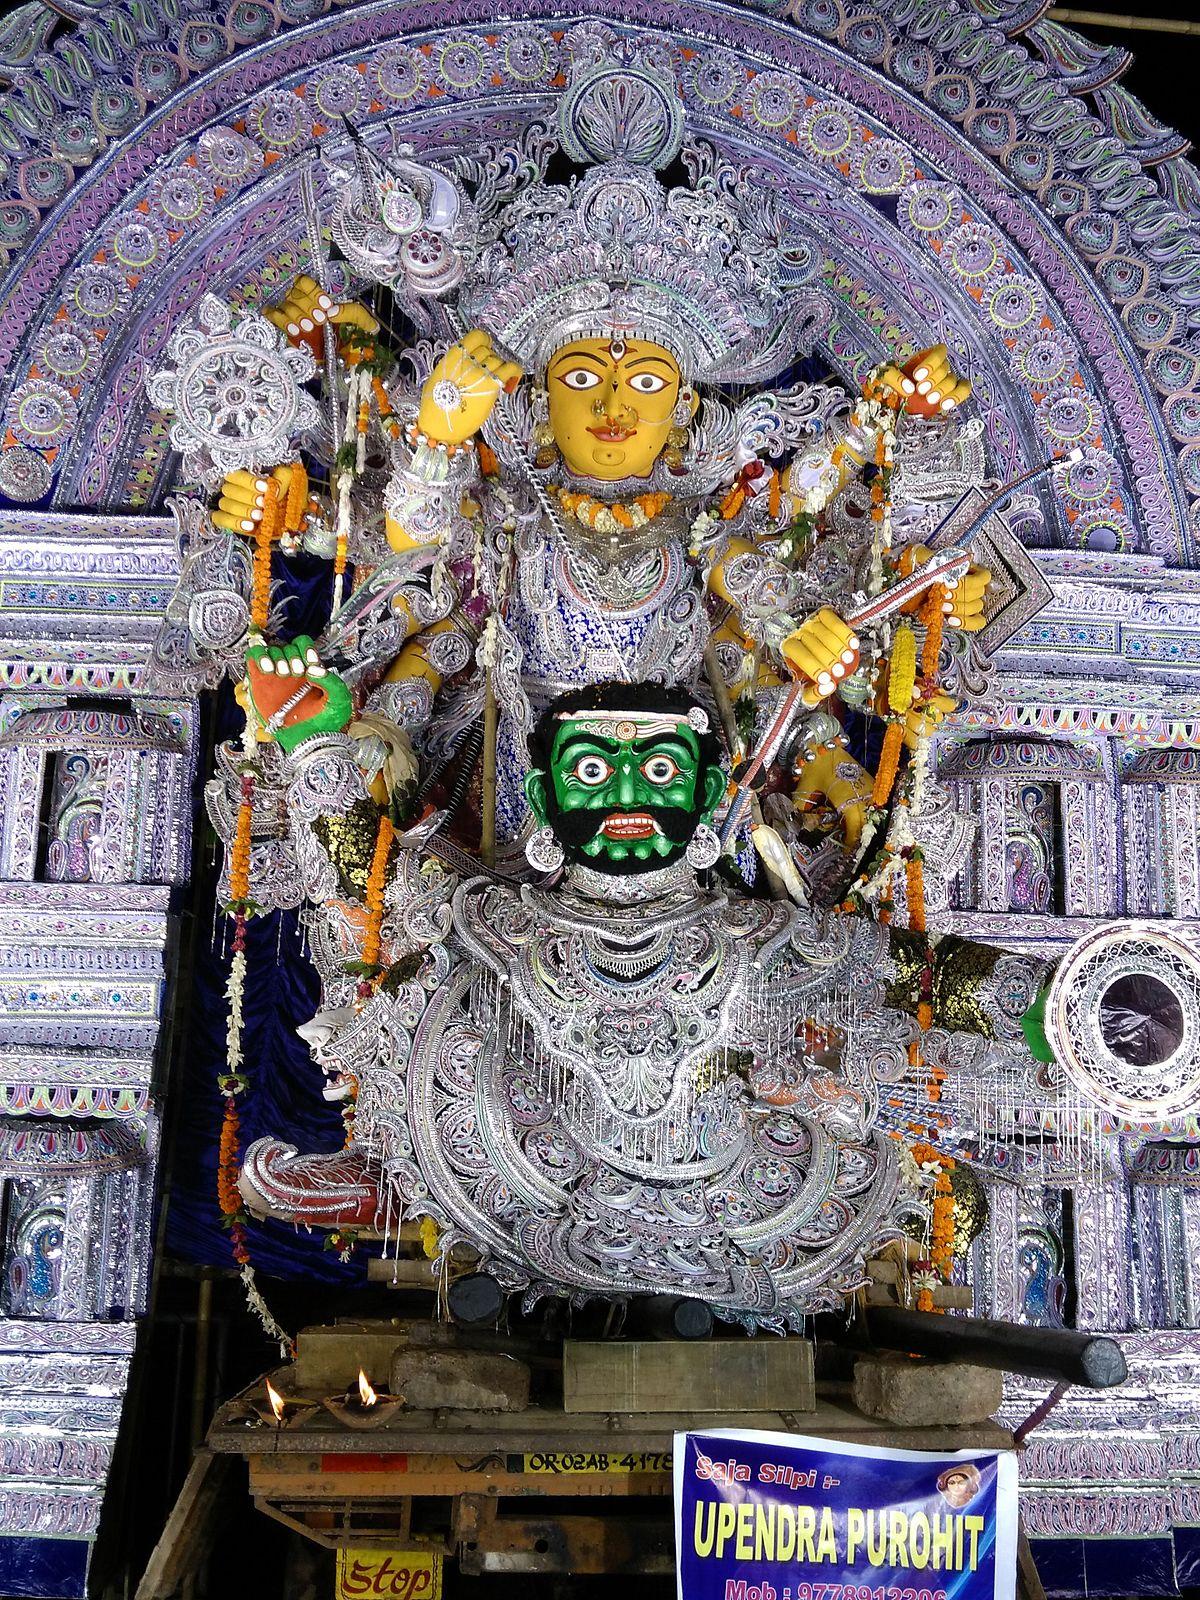 Durga puja in odisha wikipedia altavistaventures Gallery